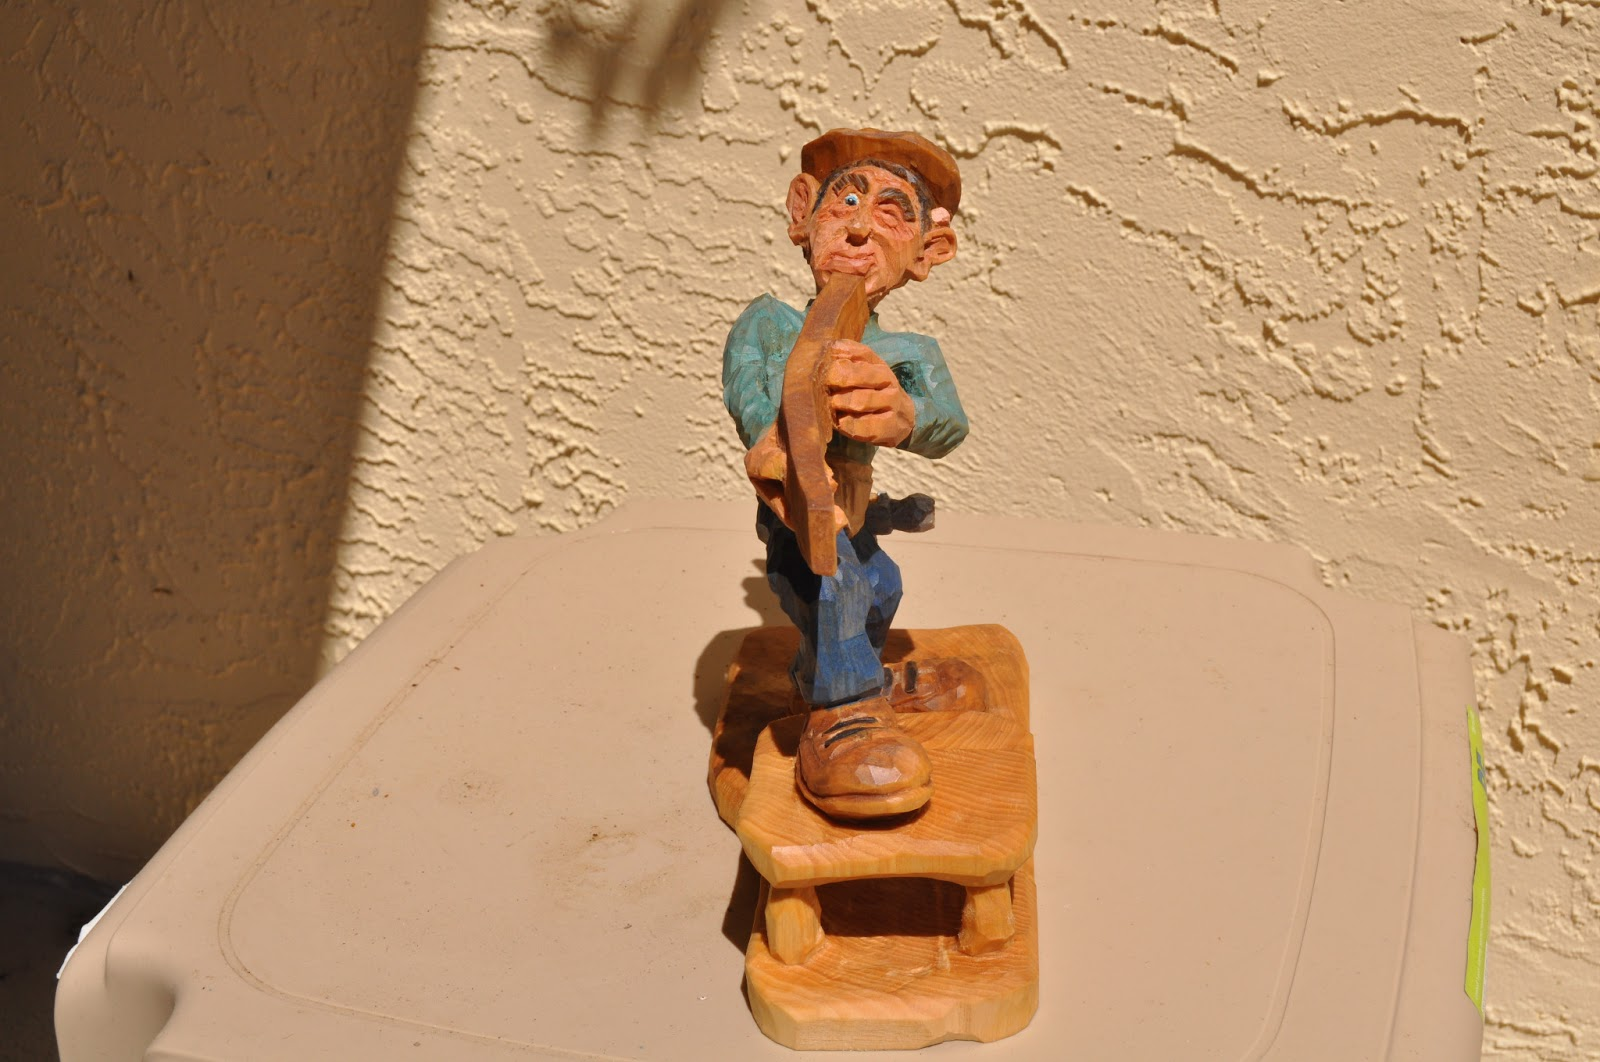 Niagara woodchipper is it straight enuff